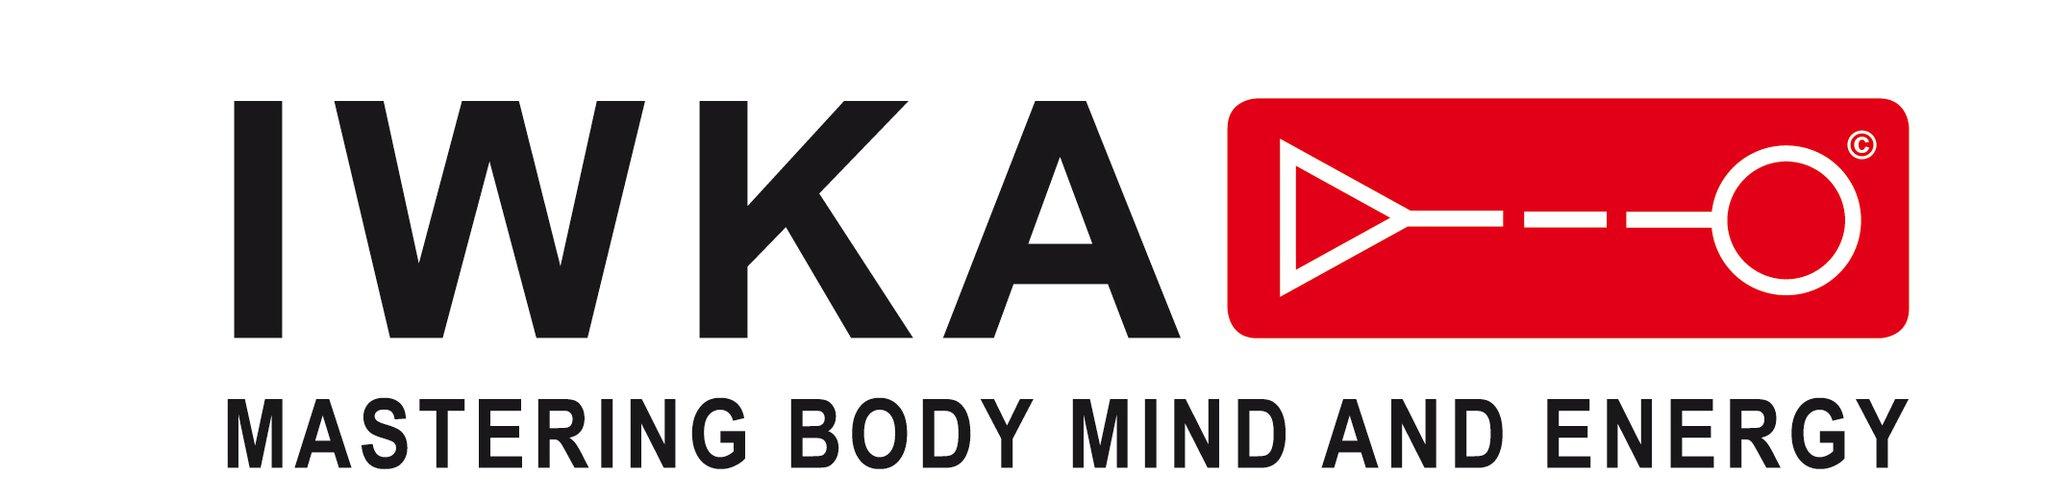 IWKA Wing Tjun Coventry - Members site - Martial Arts Classes in COVENTRY